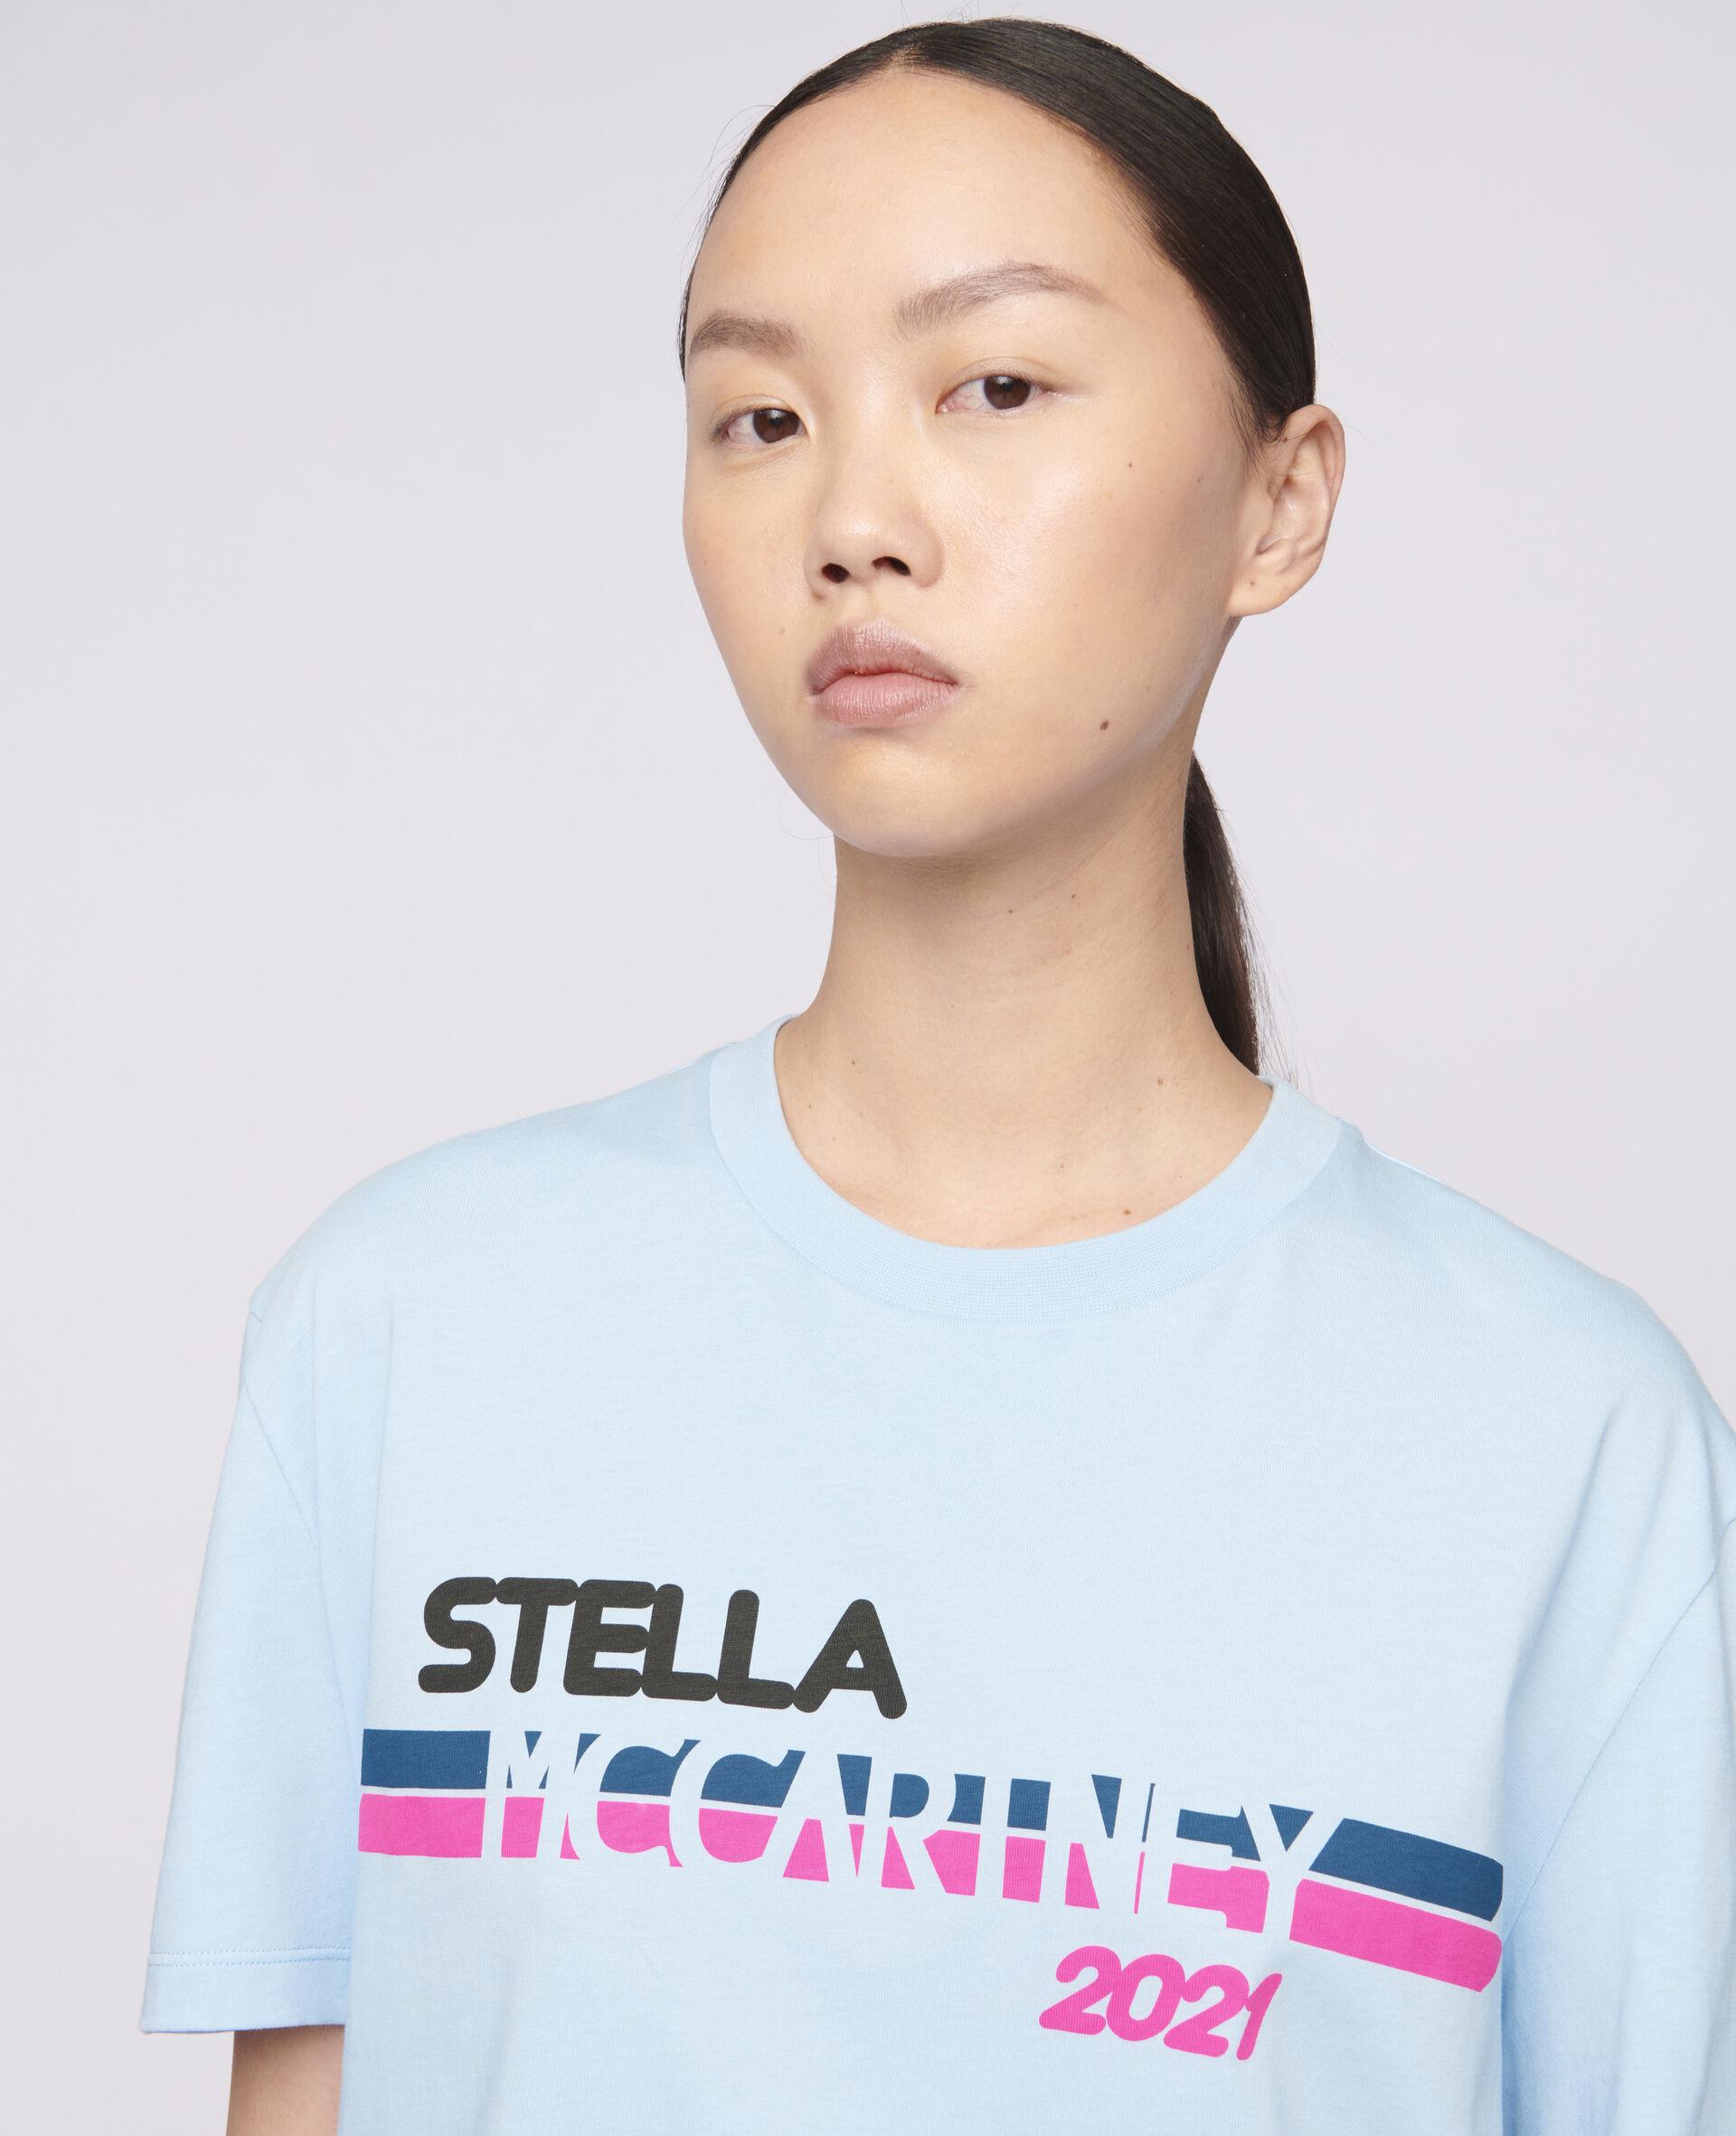 Stella McCartney 2021 Logo T-Shirt-Blue-large image number 3